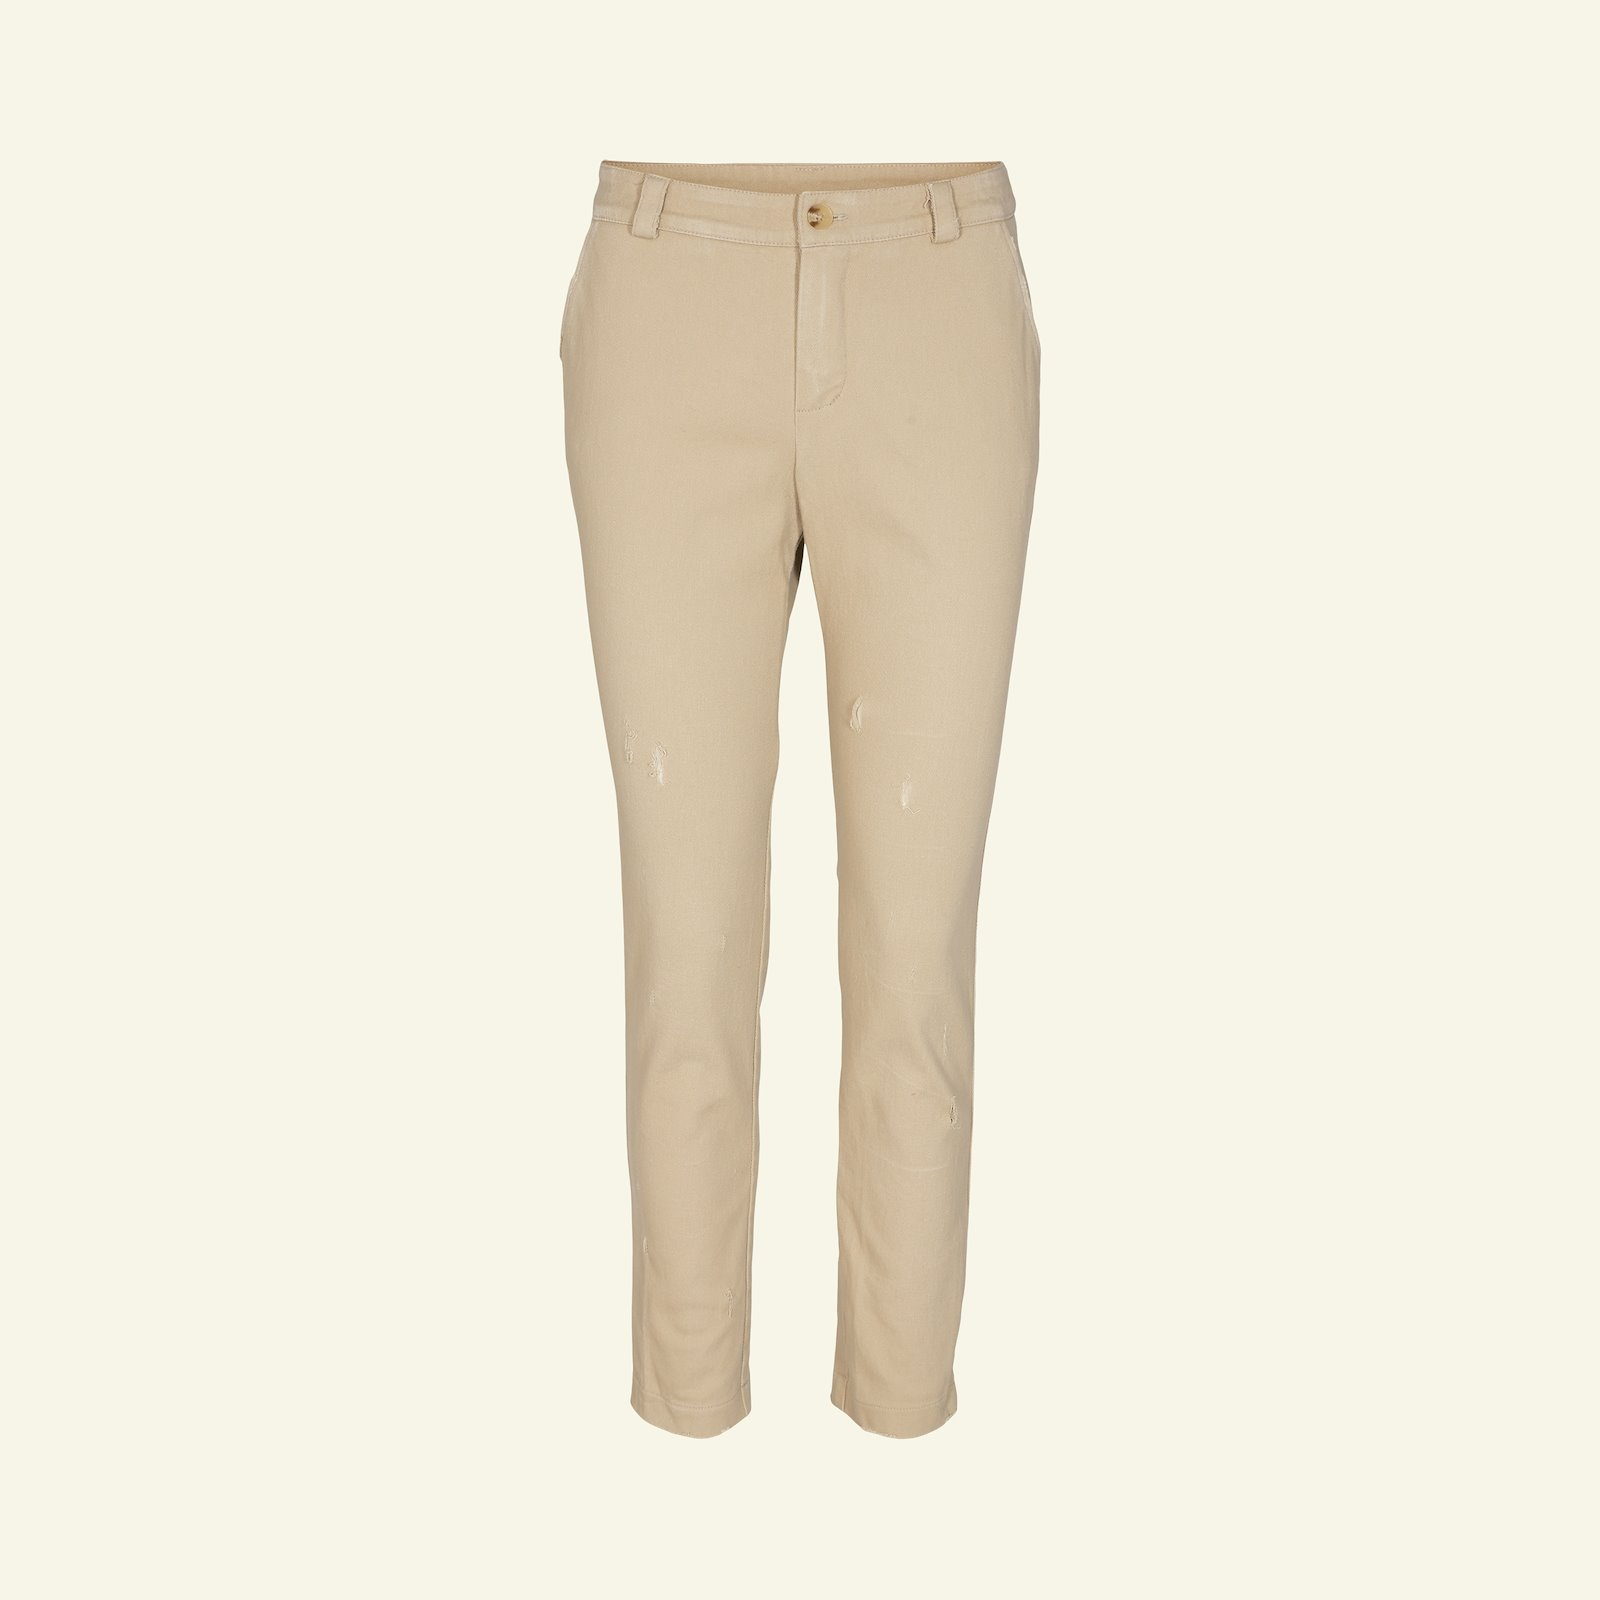 Trousers, 34/6 p20033_460842_sskit